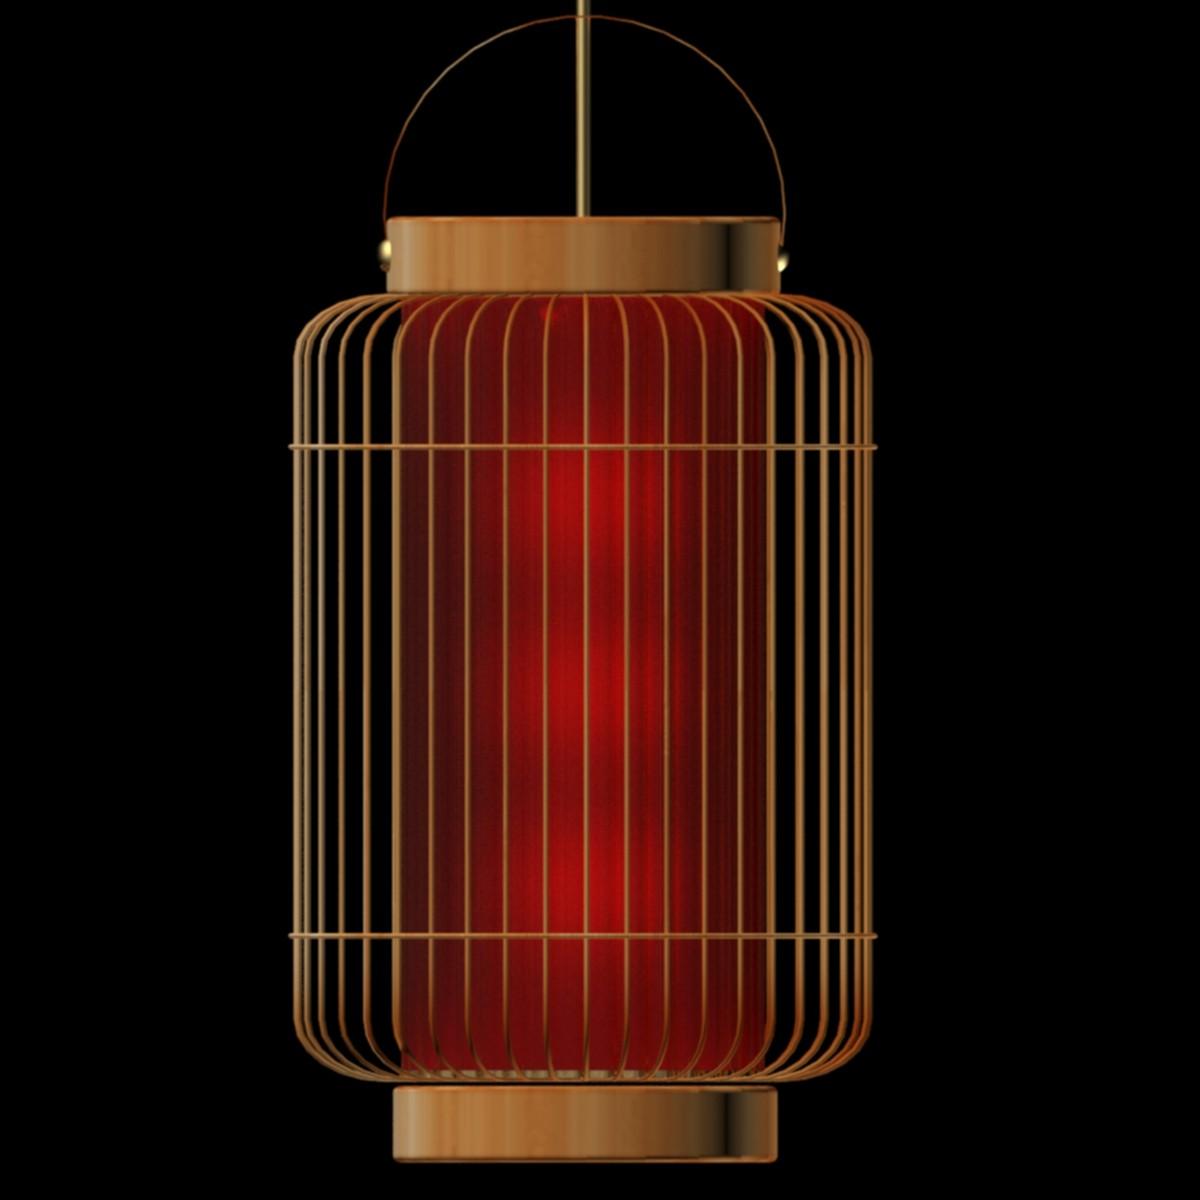 chinese_cage_glass_tube_lantern1.jpg